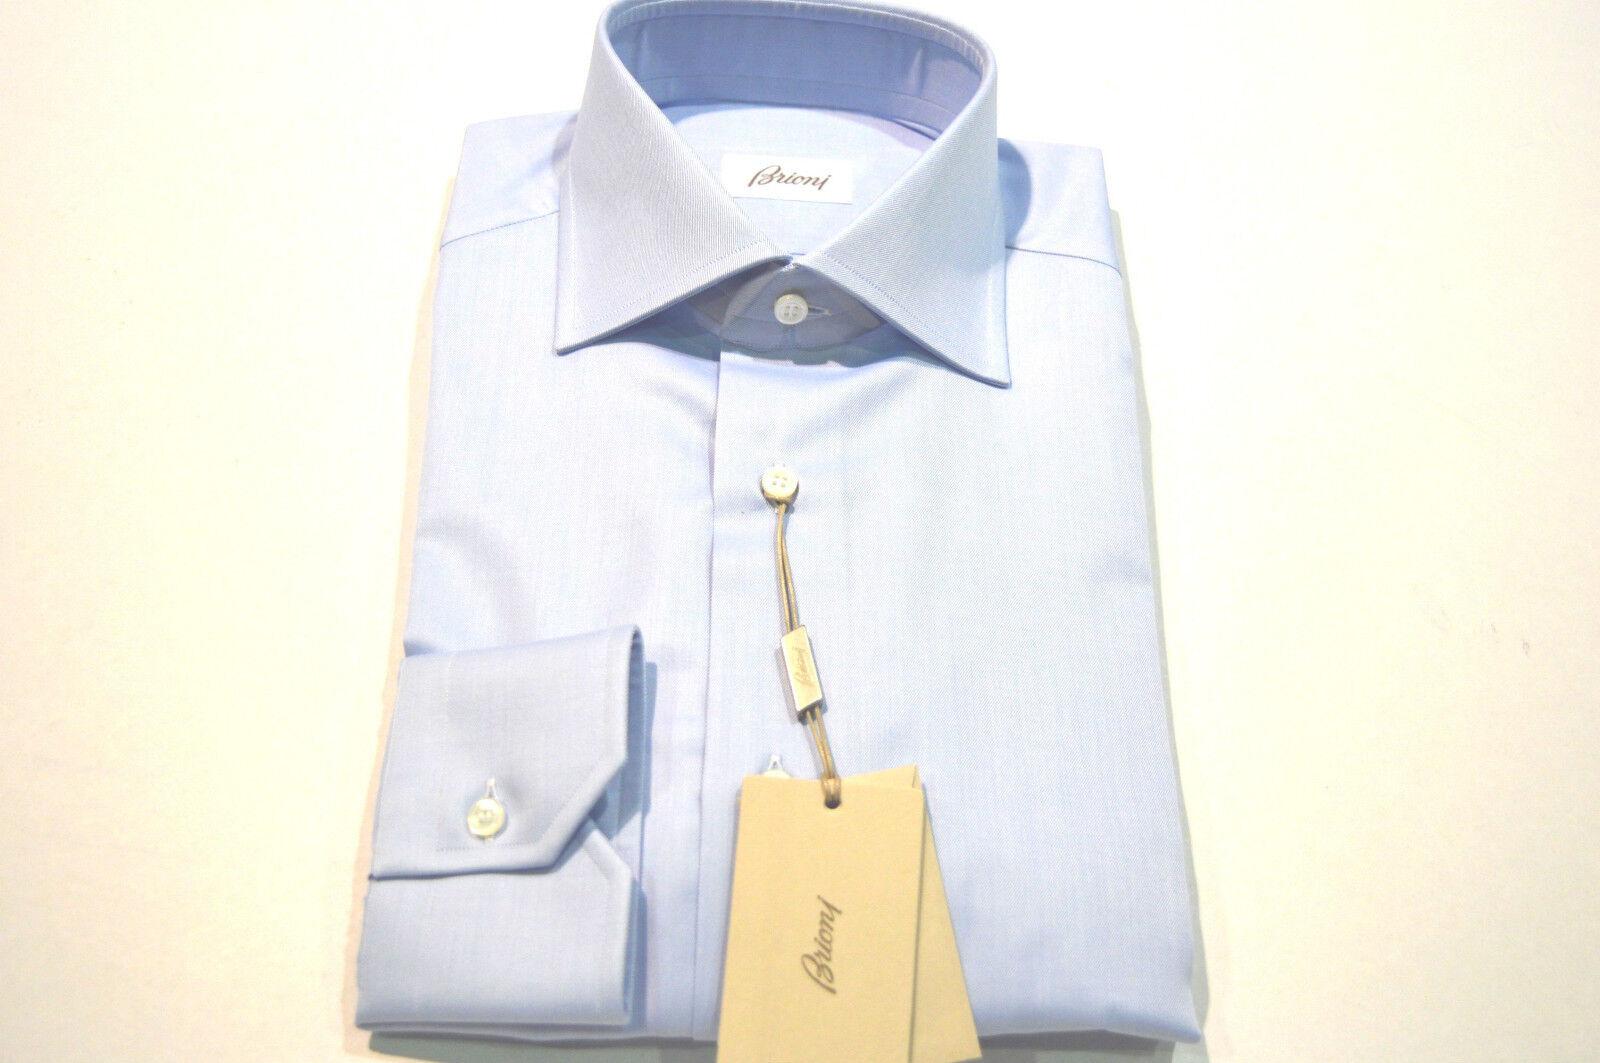 05492989 NEW BRIONI SHIRT 100% Cotton Size Us 45 Eu White (Store Code SE8) 17.75  Dress npddnk6512-Dress Shirts